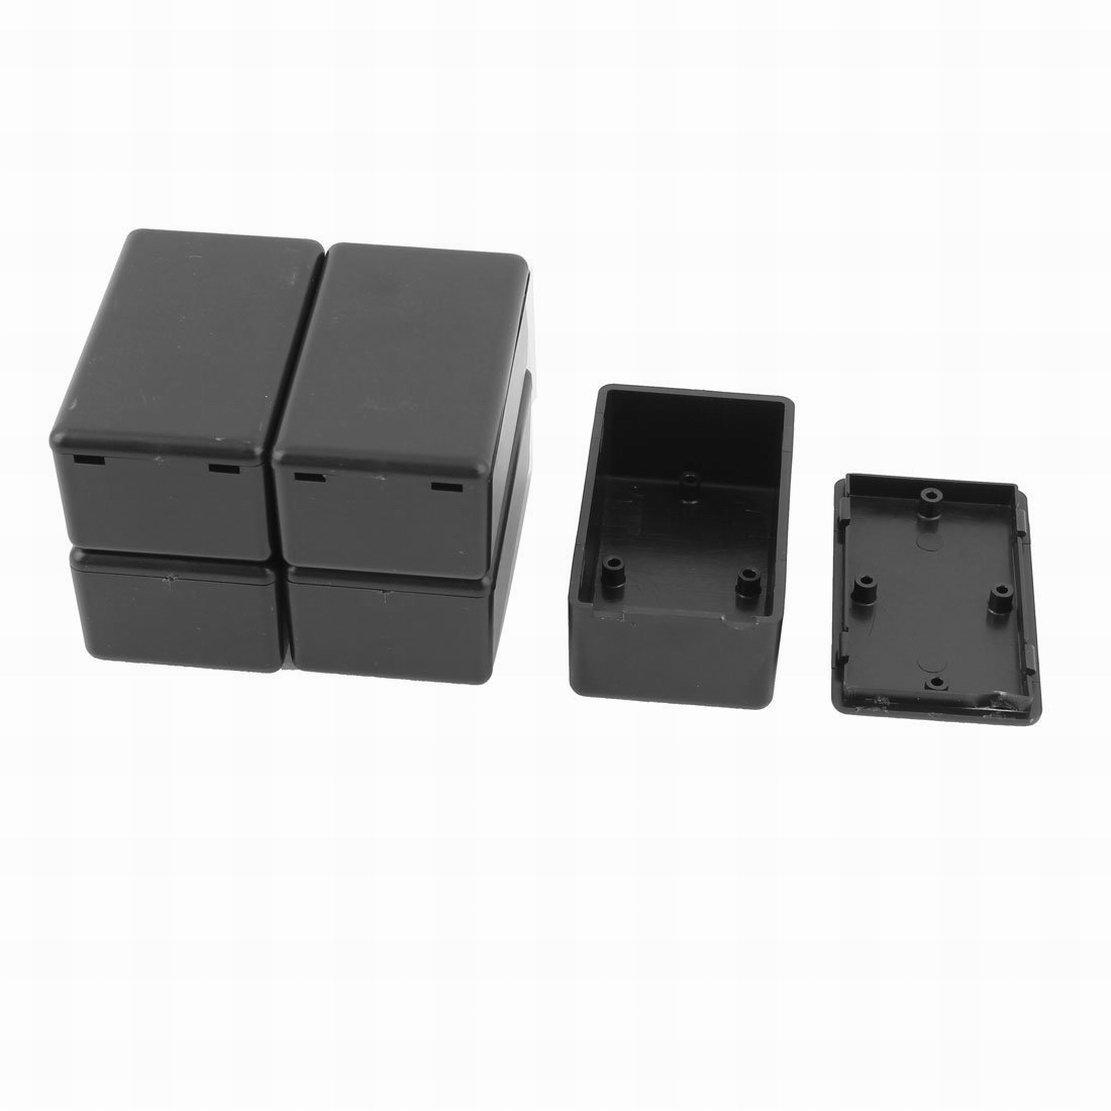 5pcs Plastic Black Electric Waterproof Junction Box Project Case 55x35x15mm